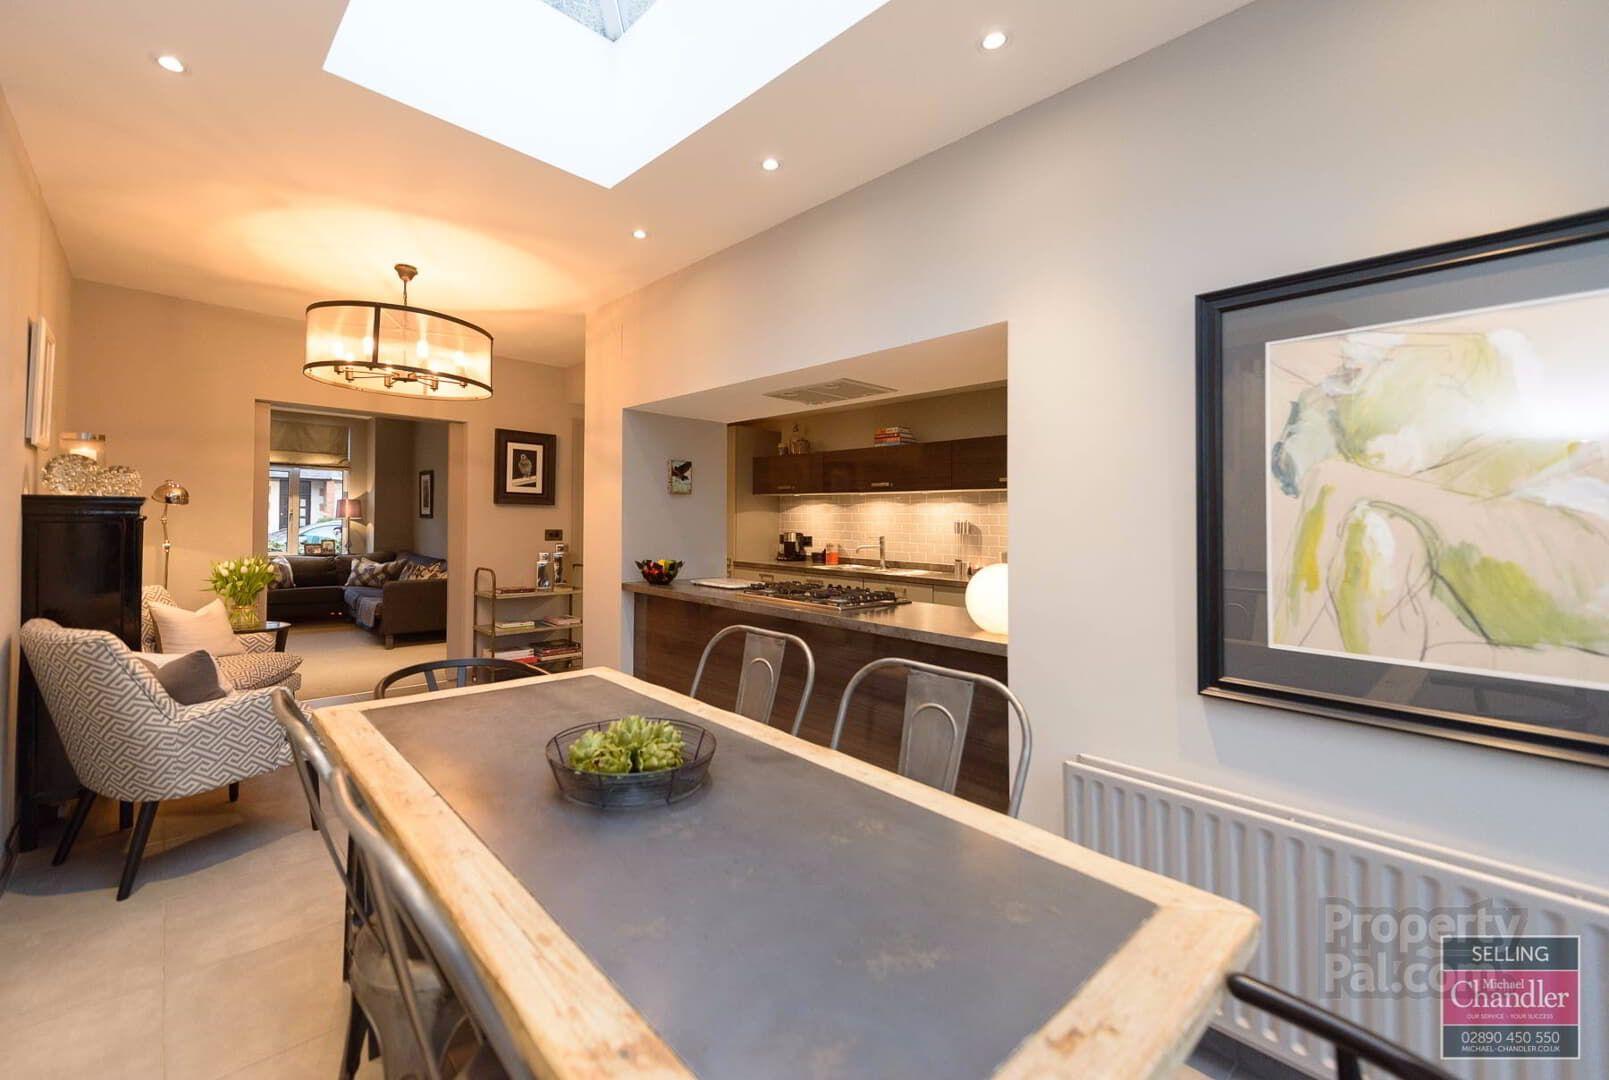 33 Loopland Crescent, Belfast | Open plan kitchen diner ...